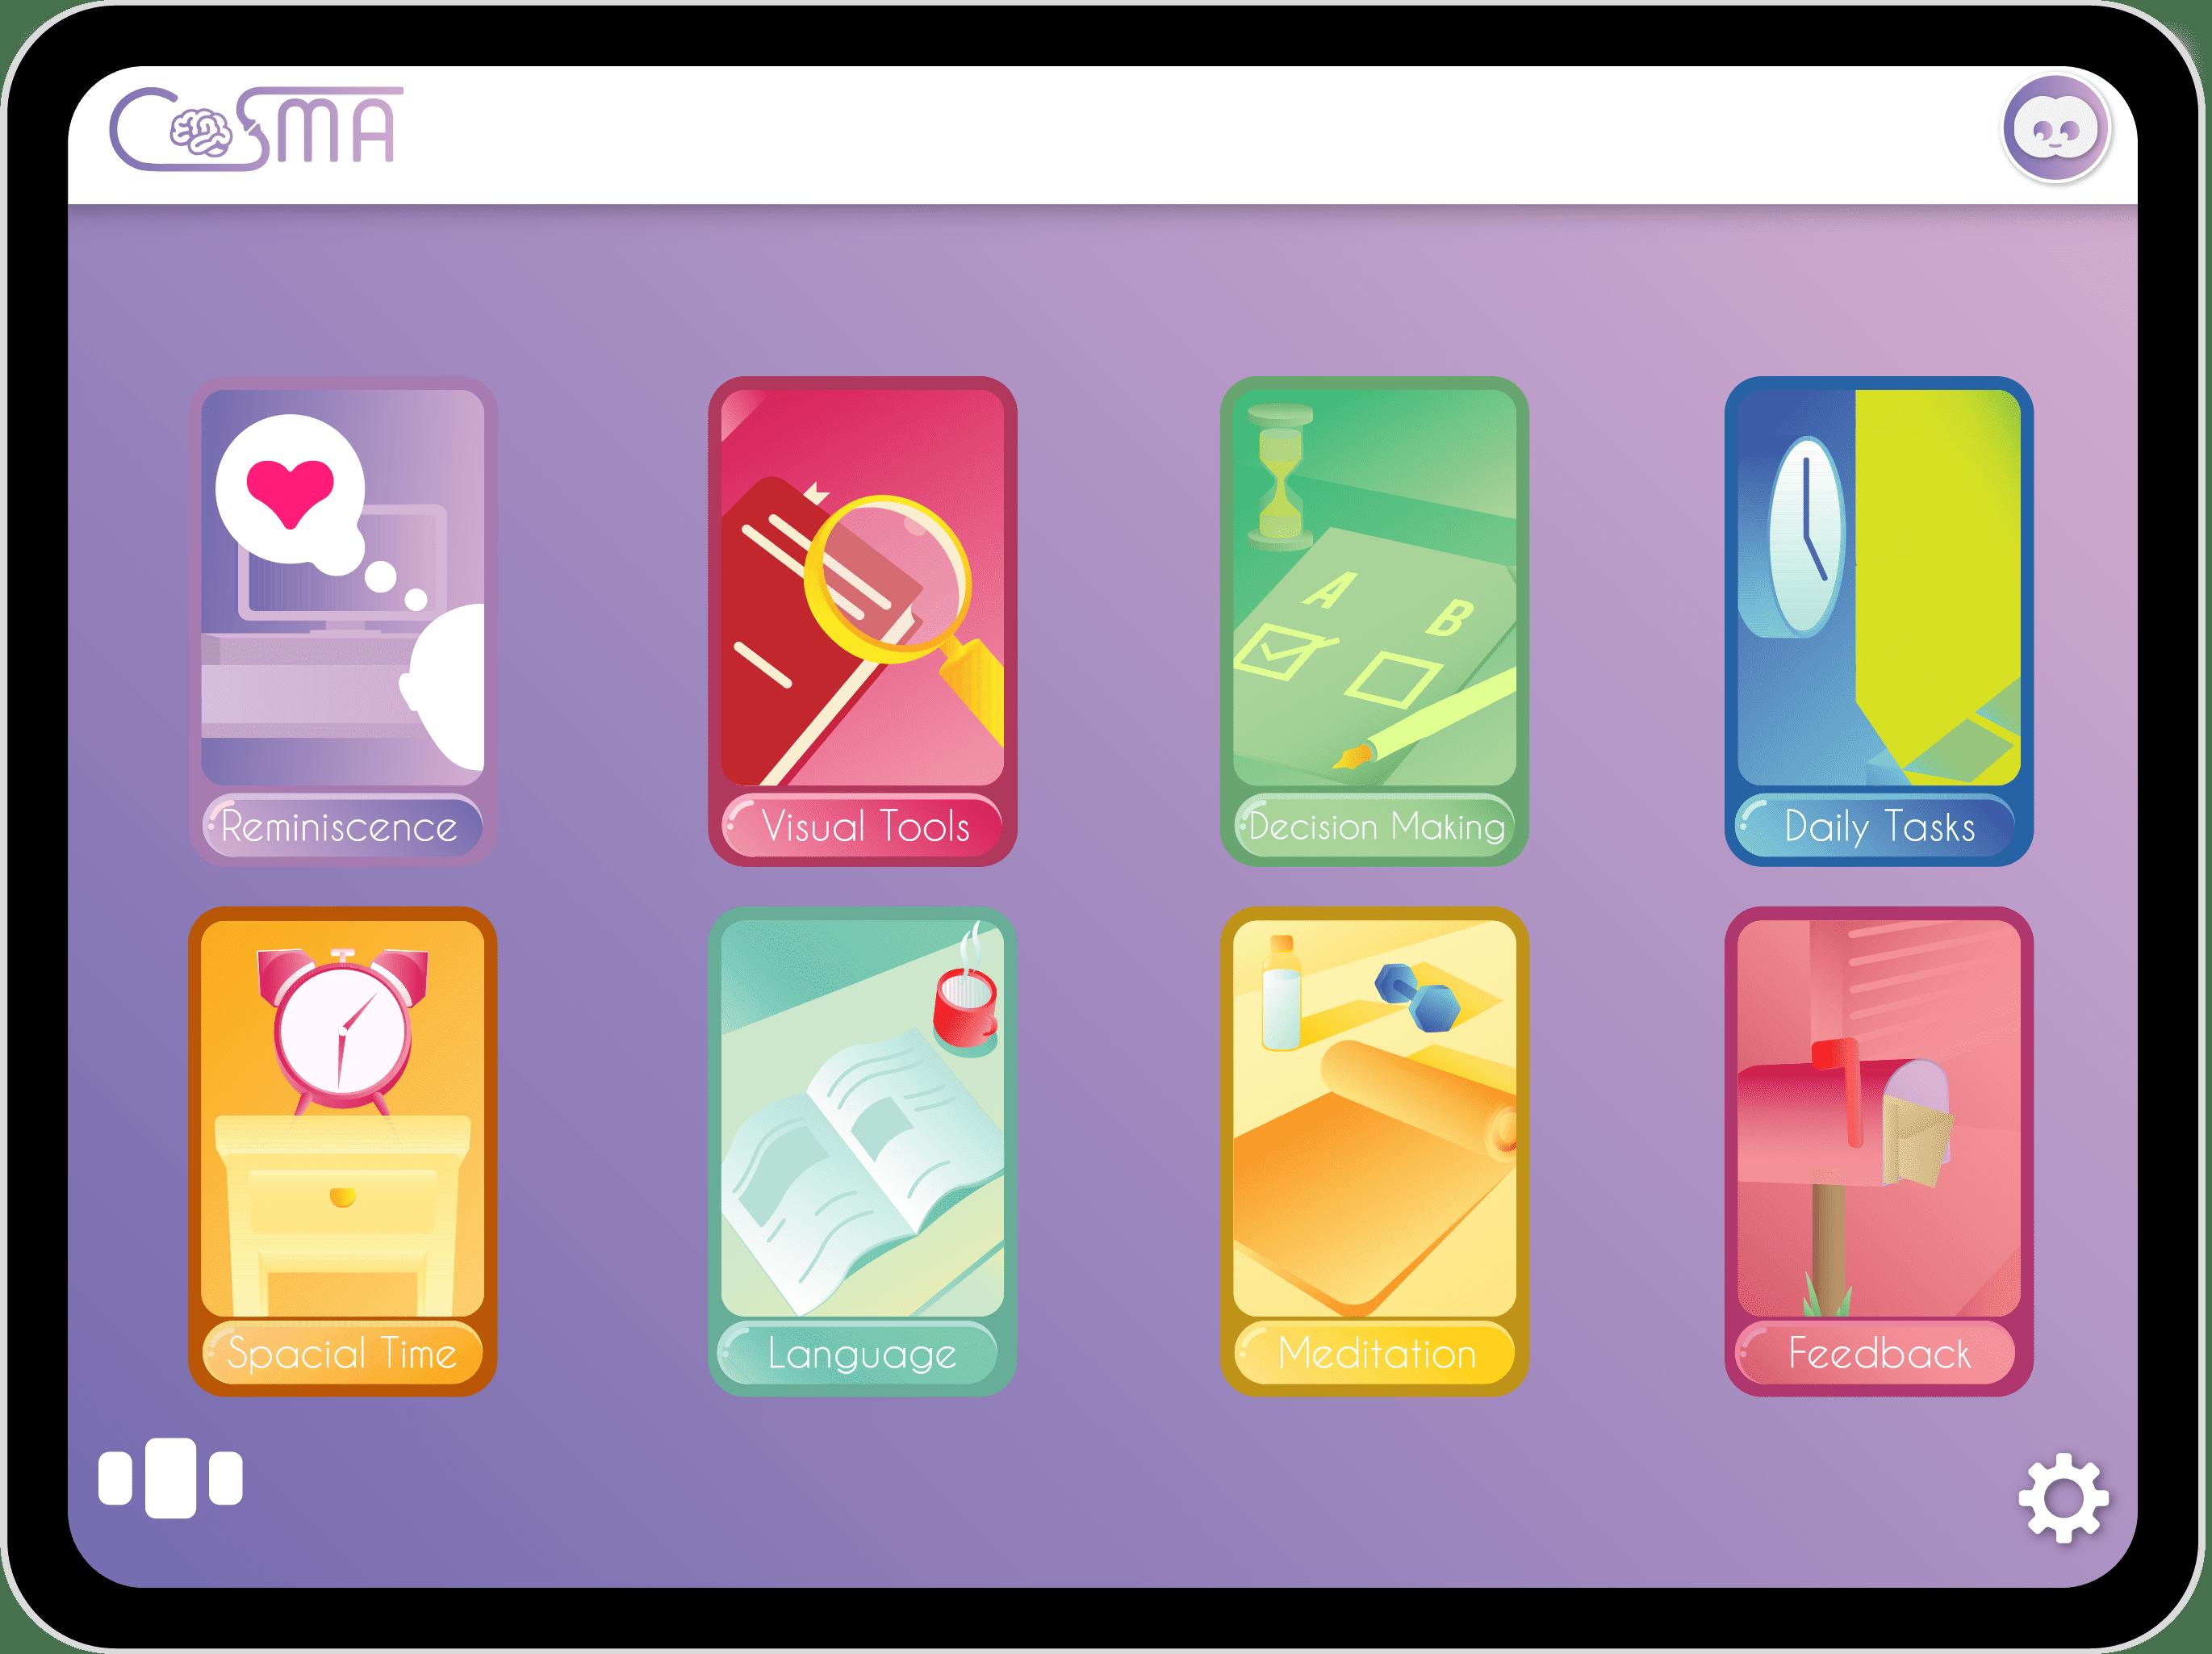 COSMA Dementia product modules